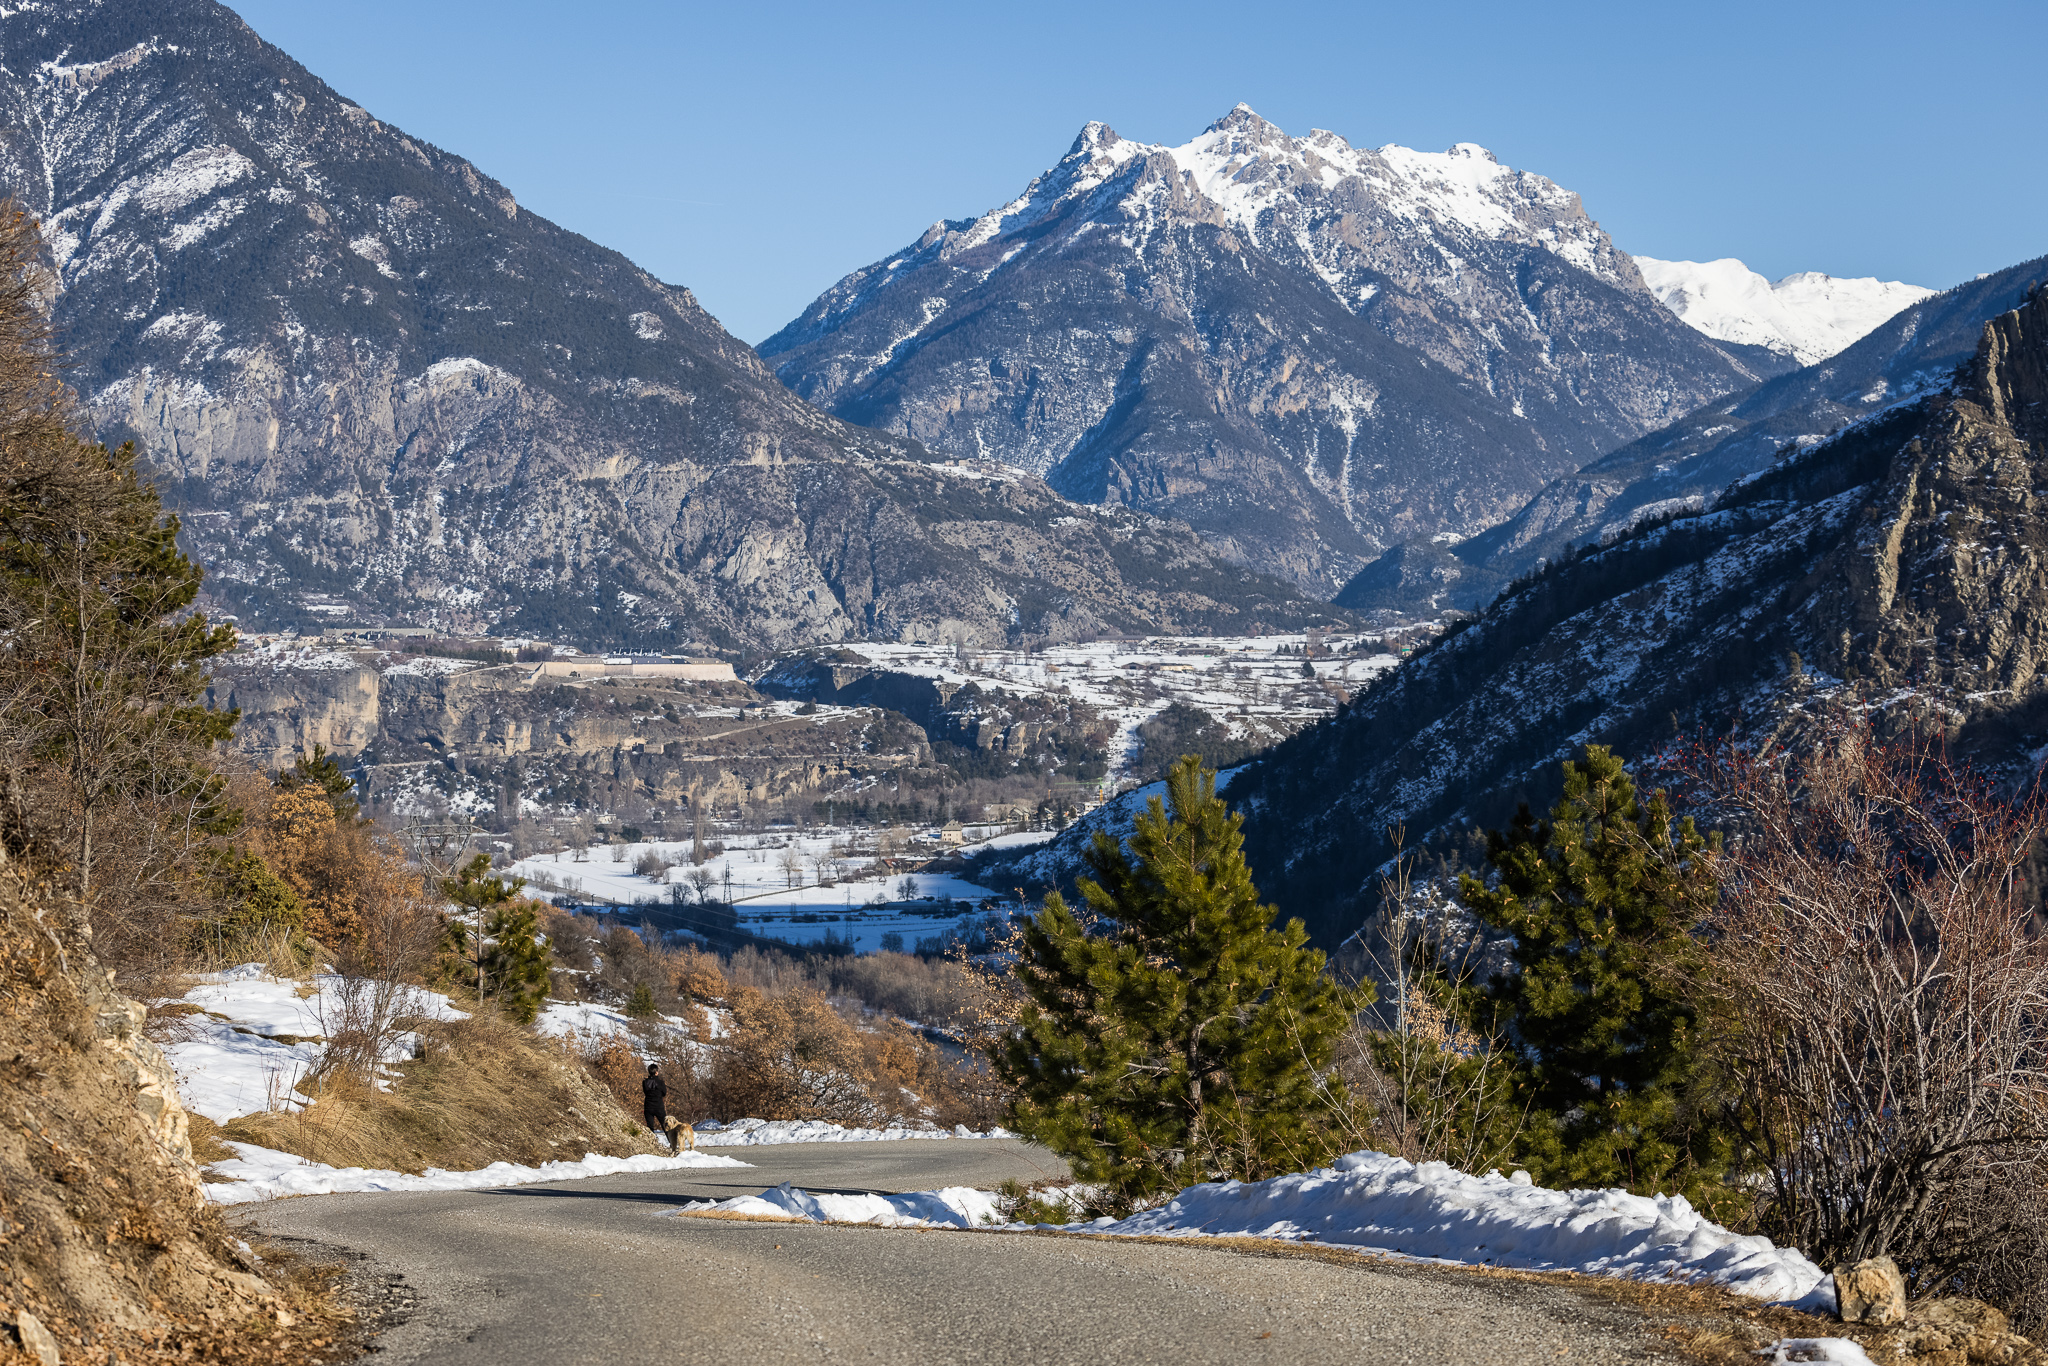 WRC: 89º Rallye Automobile de Monte-Carlo [18-24 Enero] - Página 2 EsFly_YWMAAq93-?format=jpg&name=large